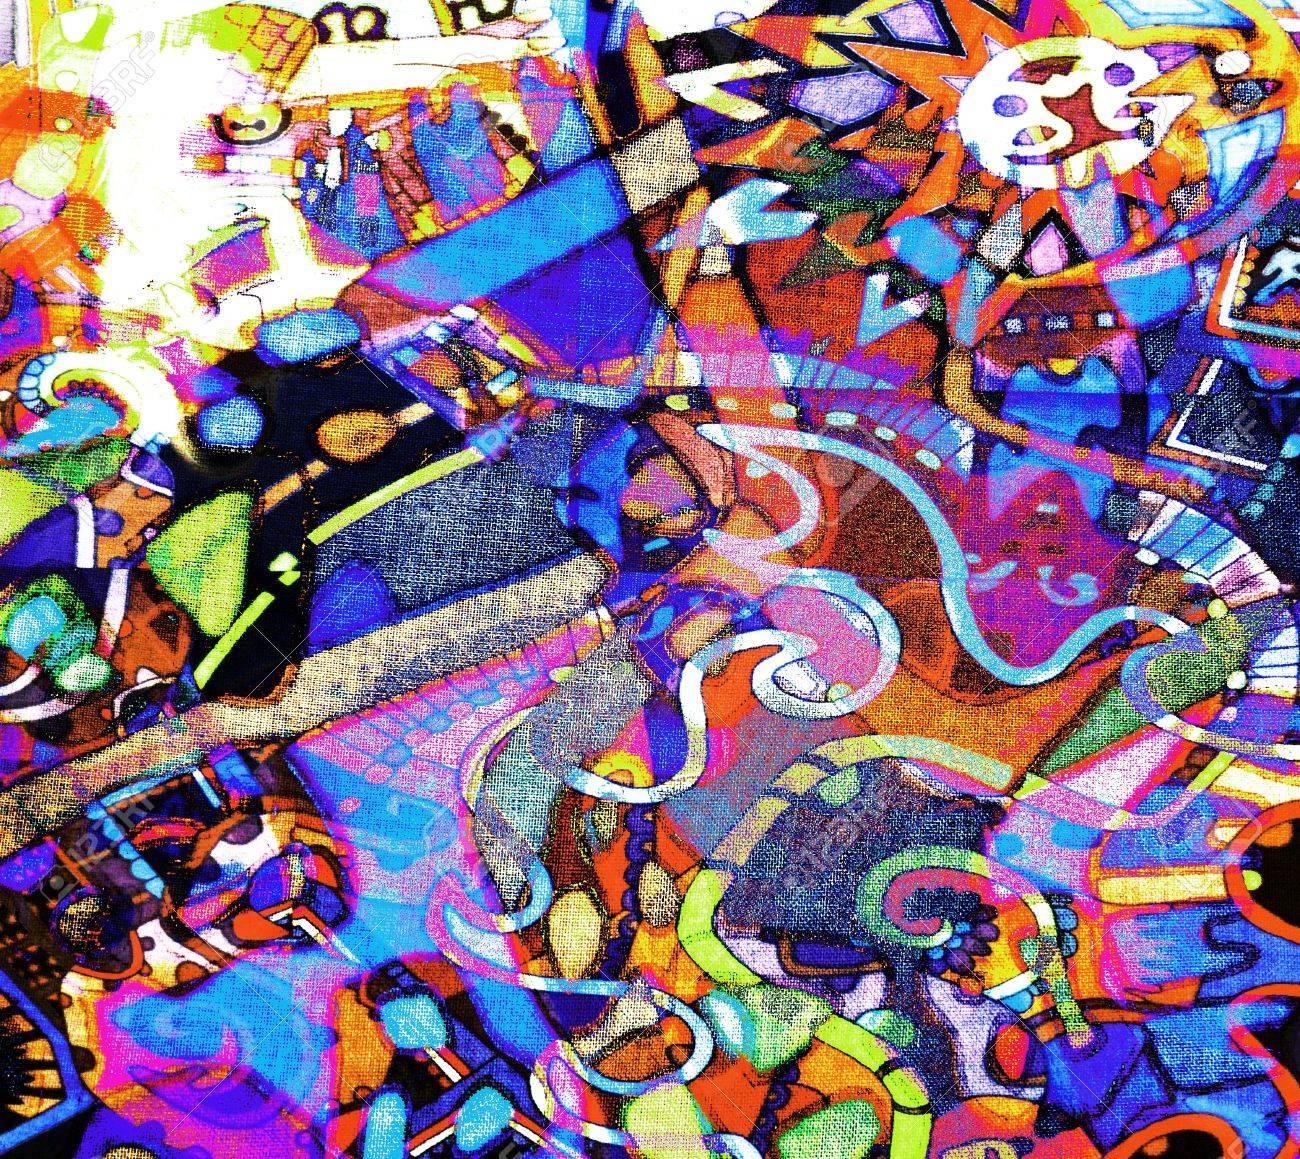 """expressive arts""的图片搜索结果"